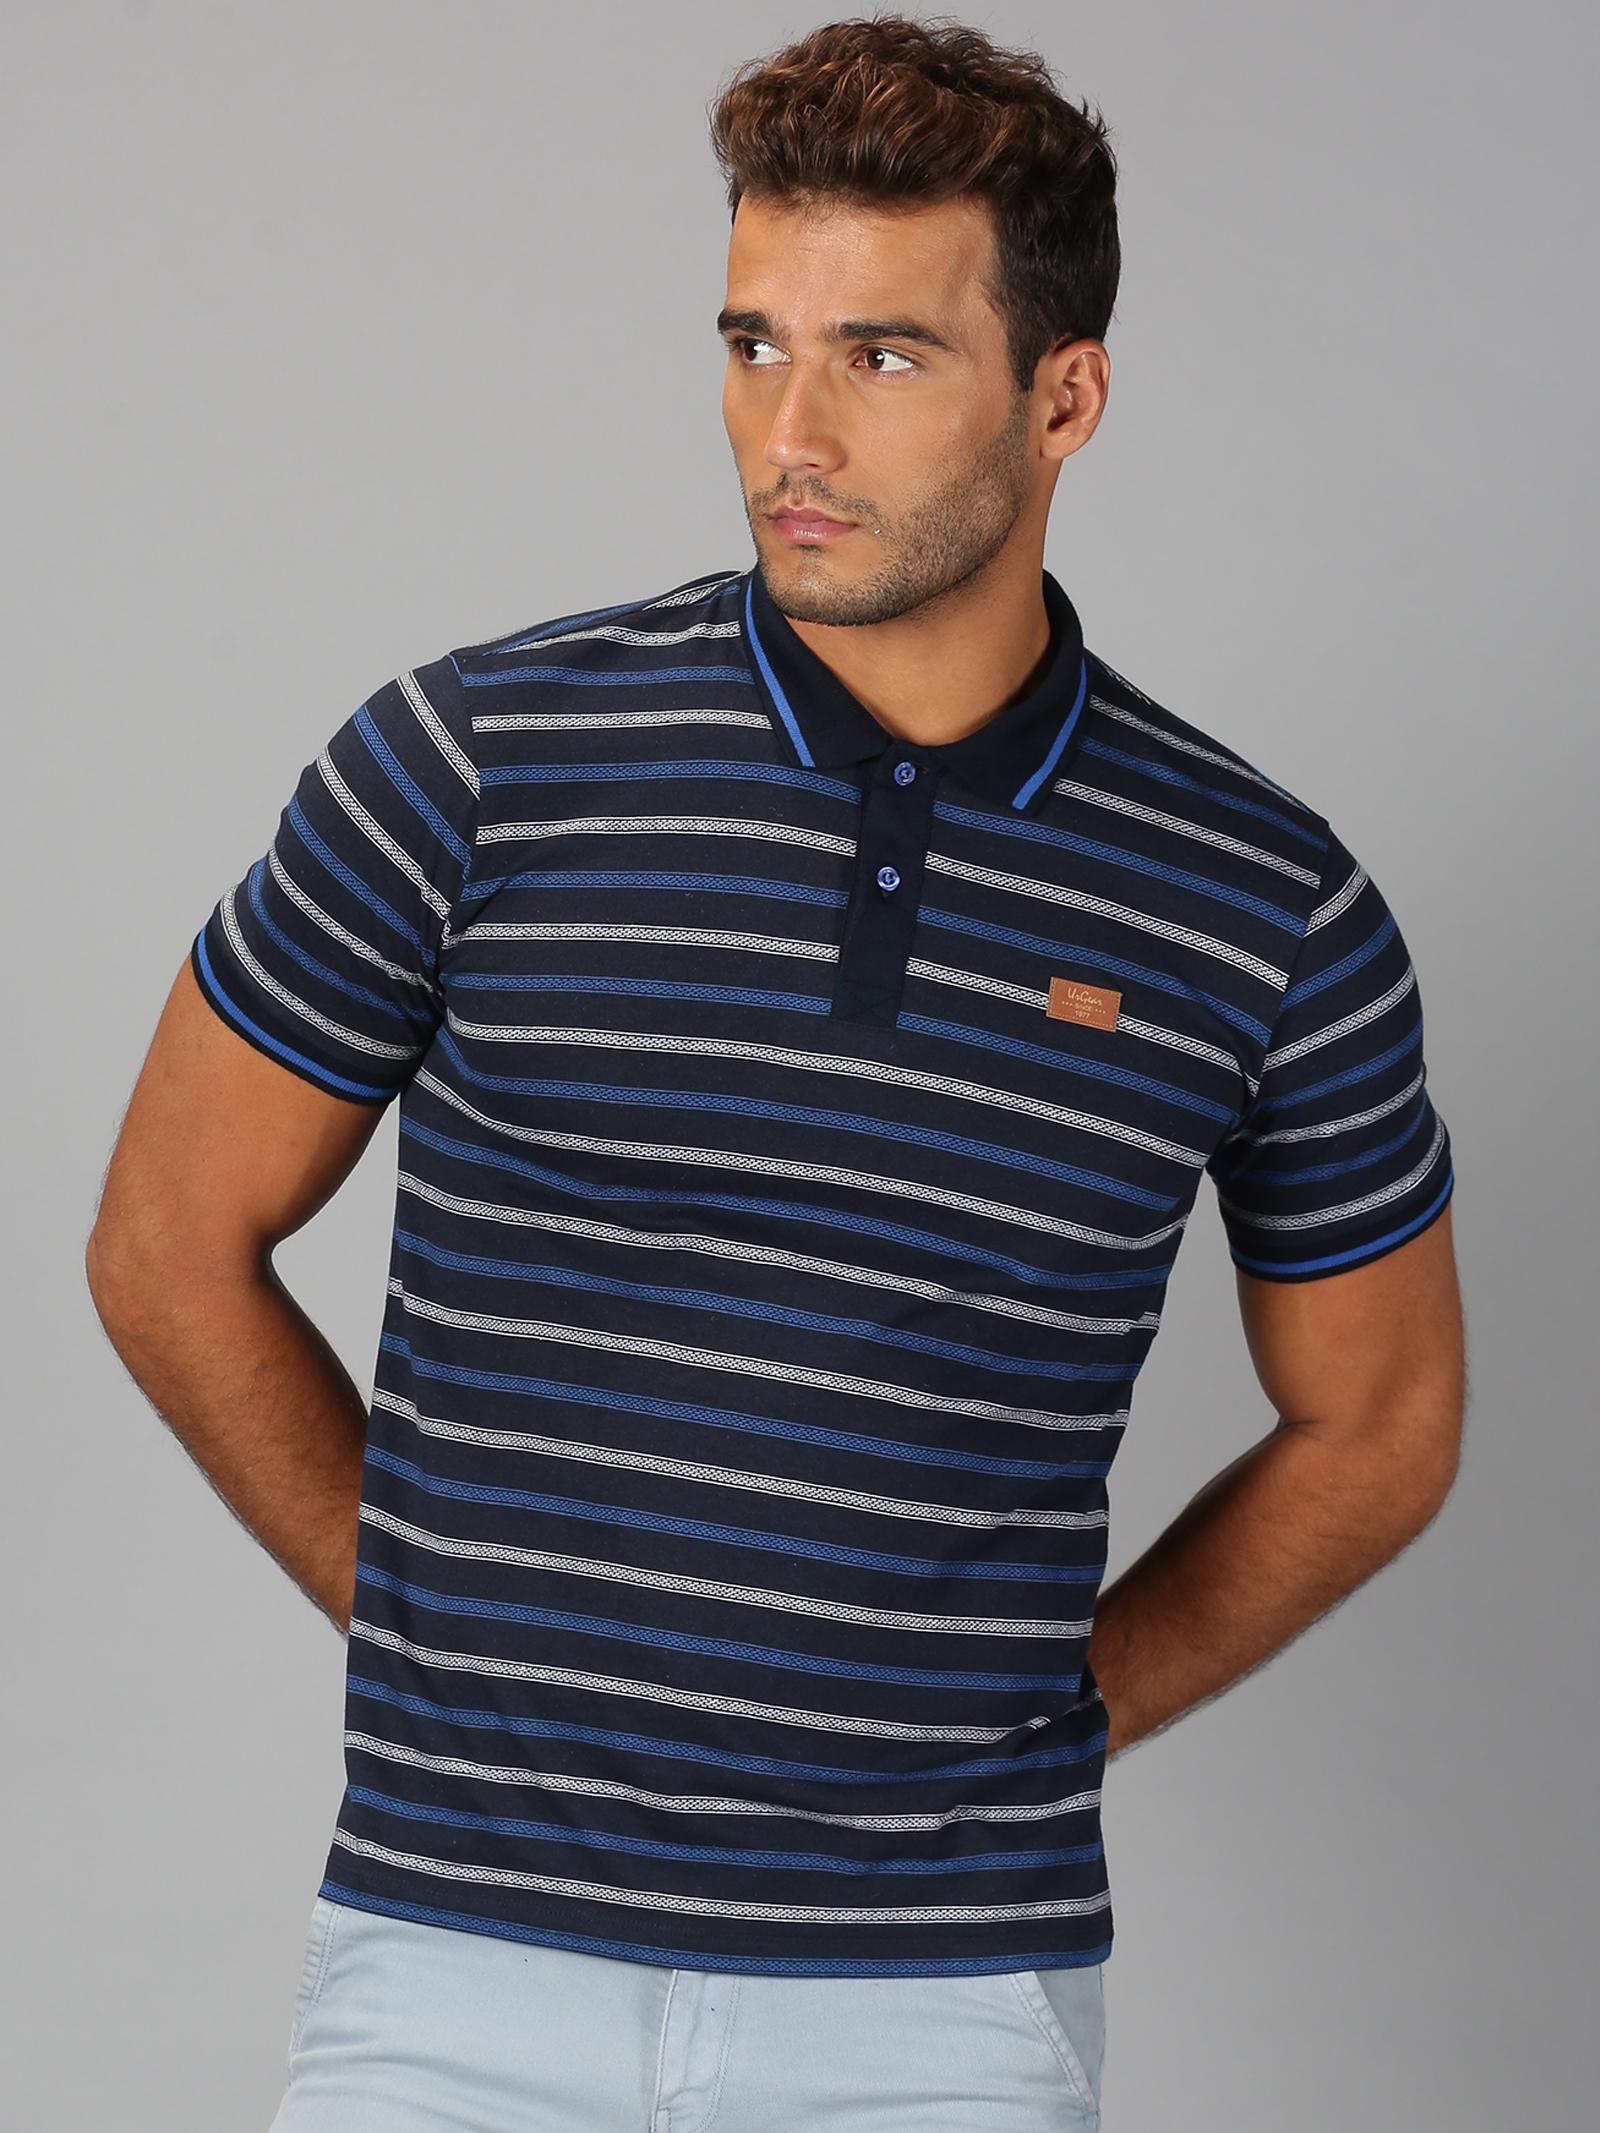 UrGear | Mens Polo Neck Striped Blue White T-Shirt